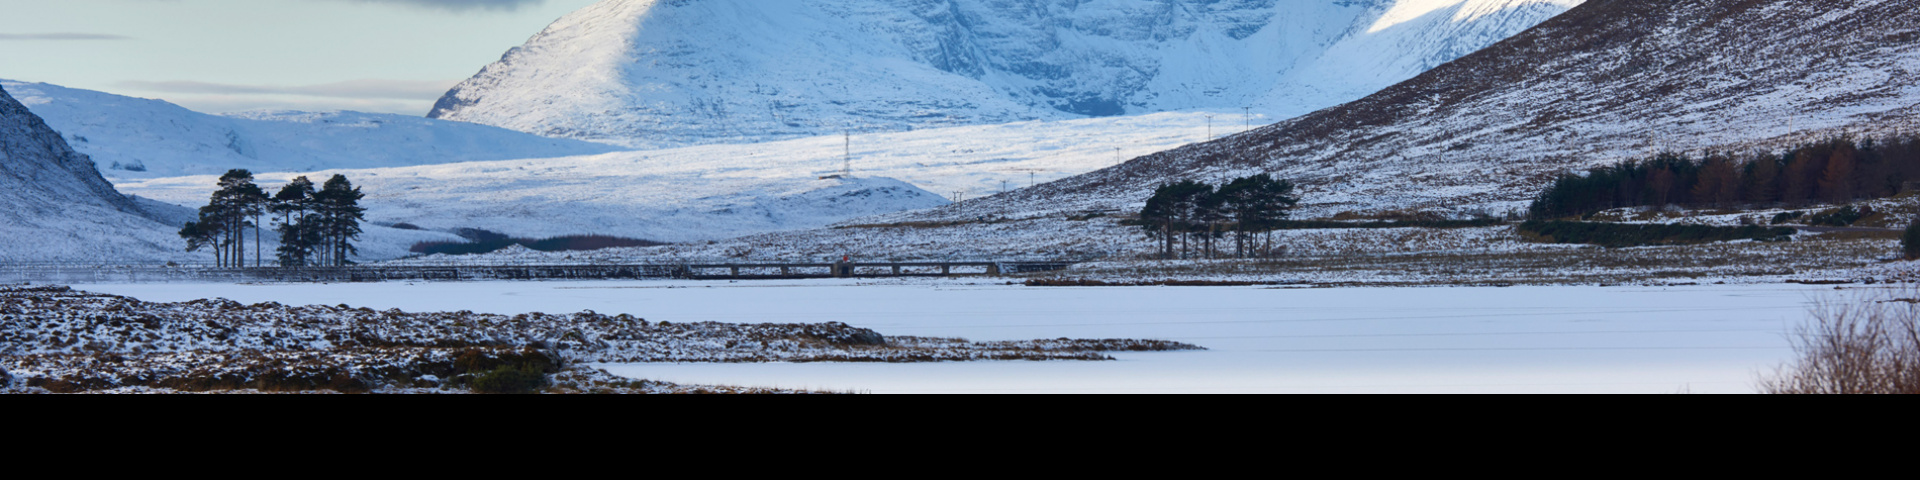 Loch Droma Ullapool